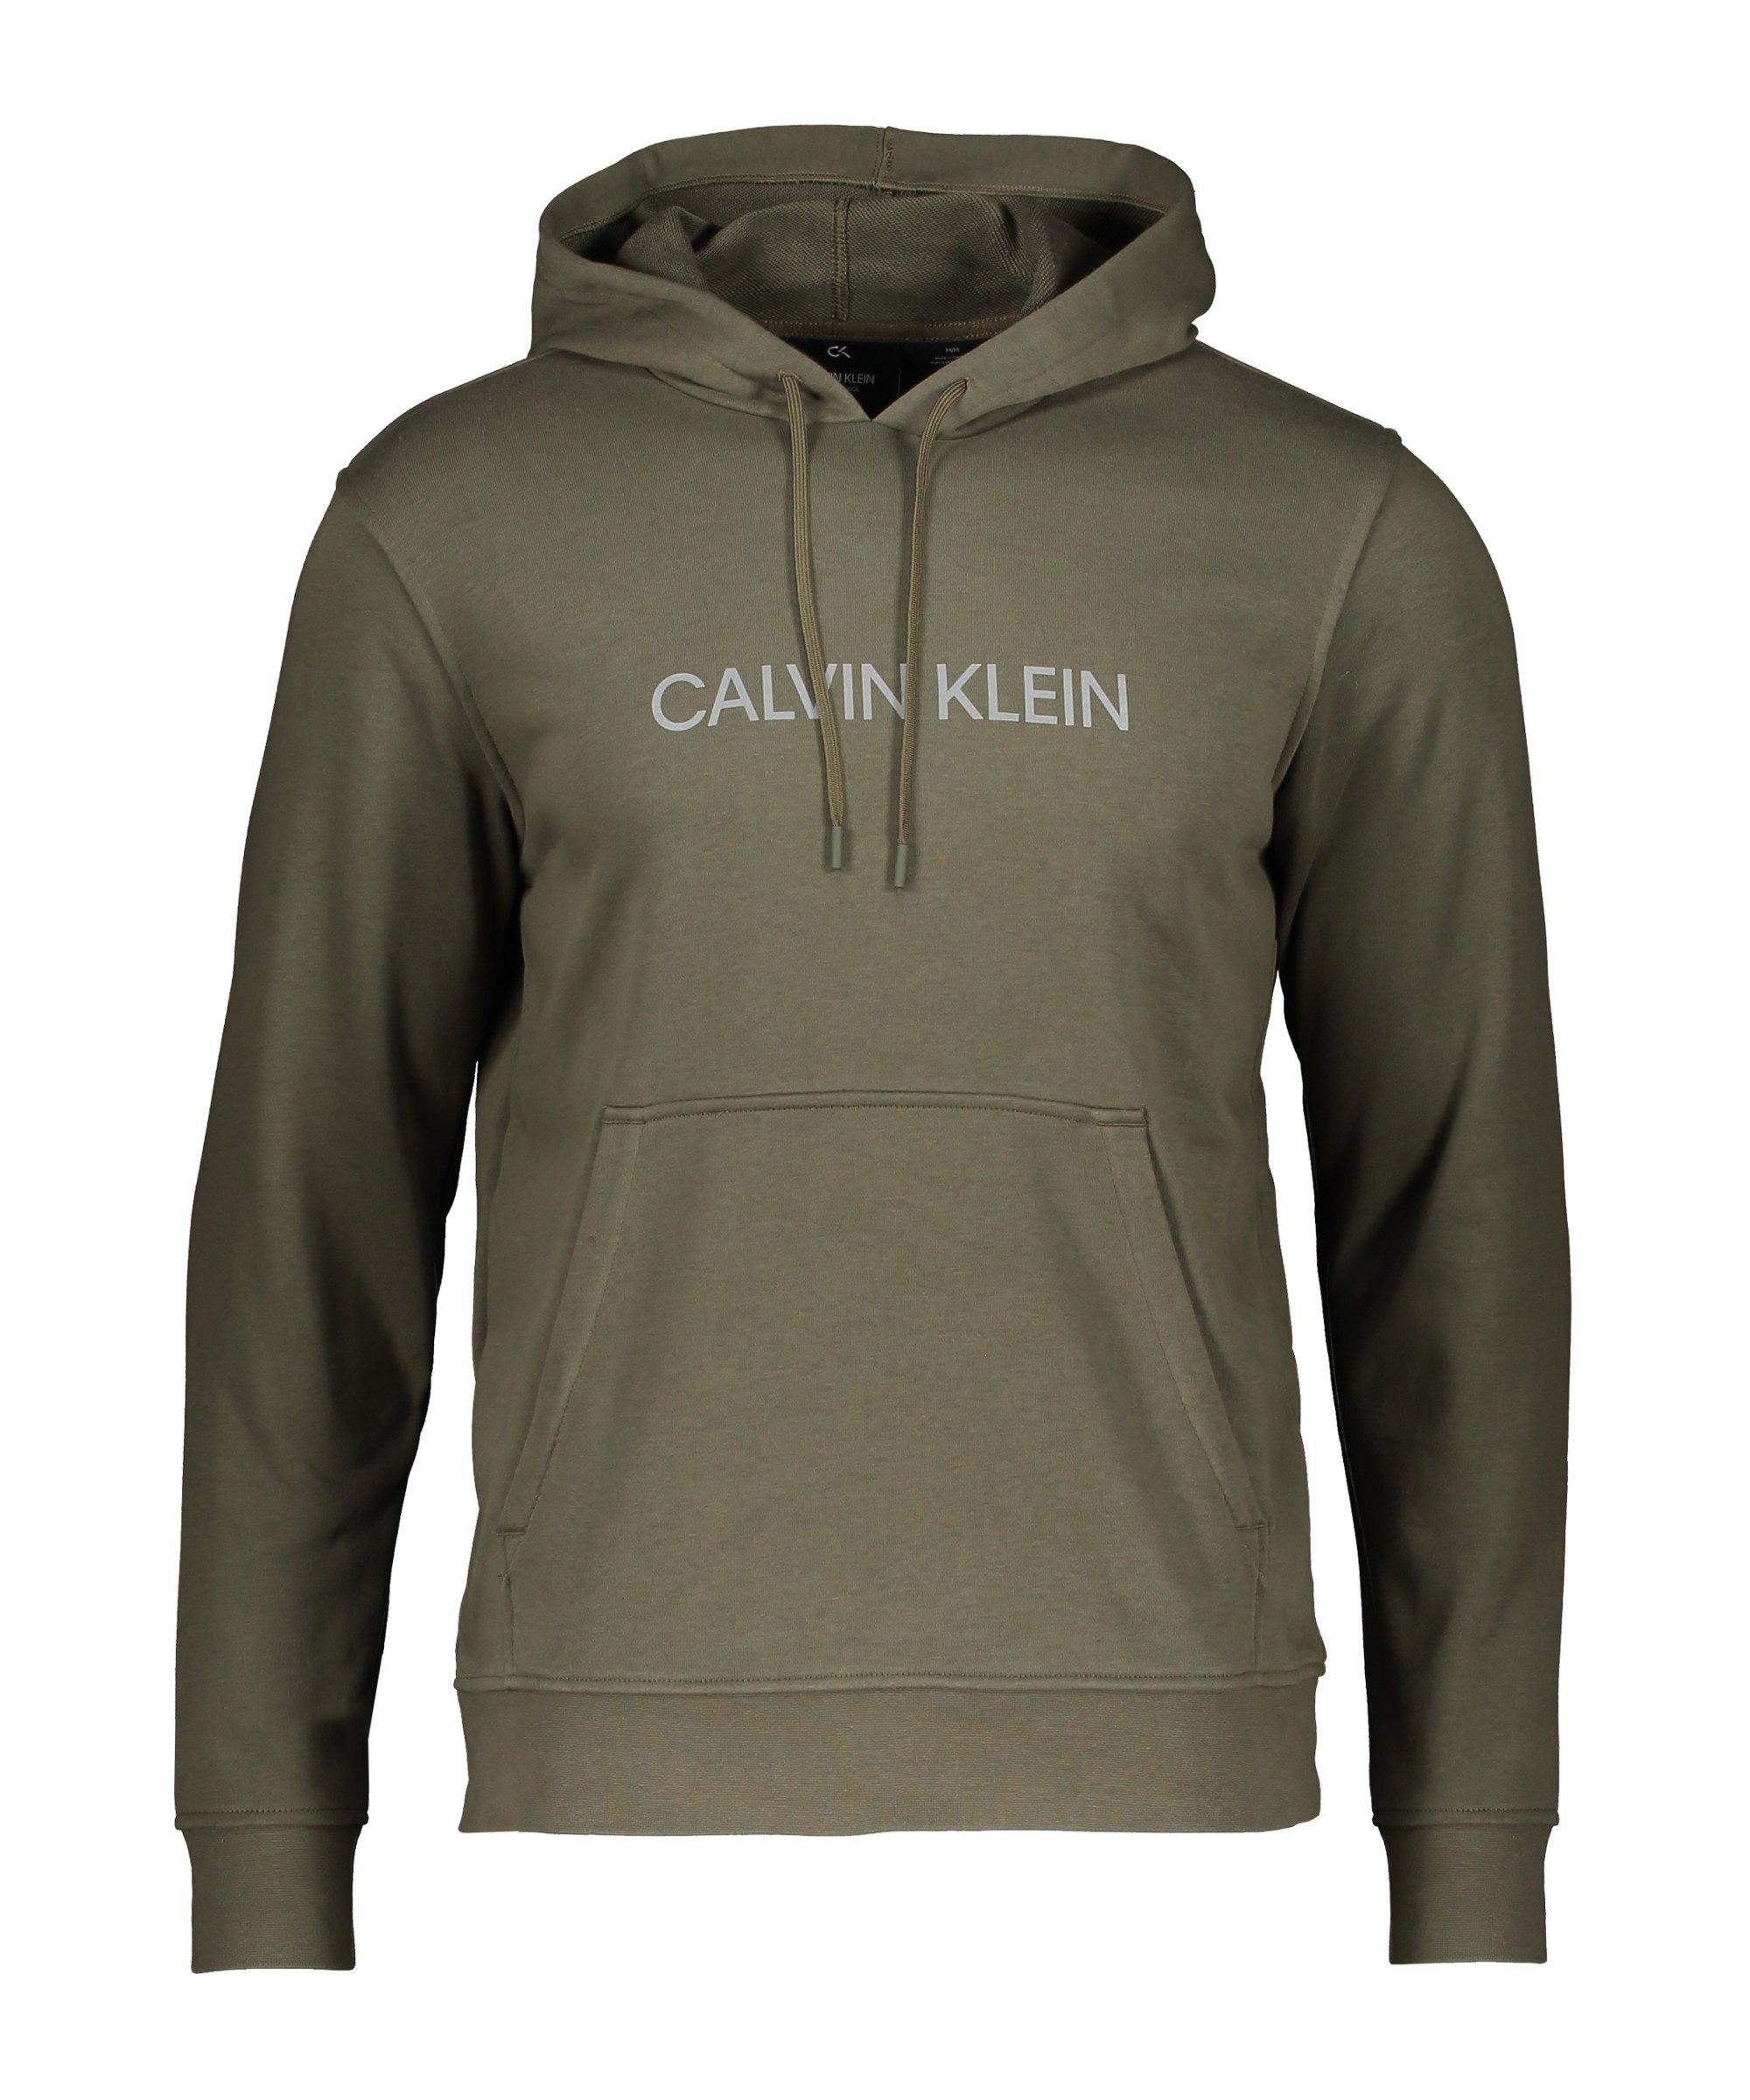 Calvin Klein Performance Hoody Grün F251 - gruen